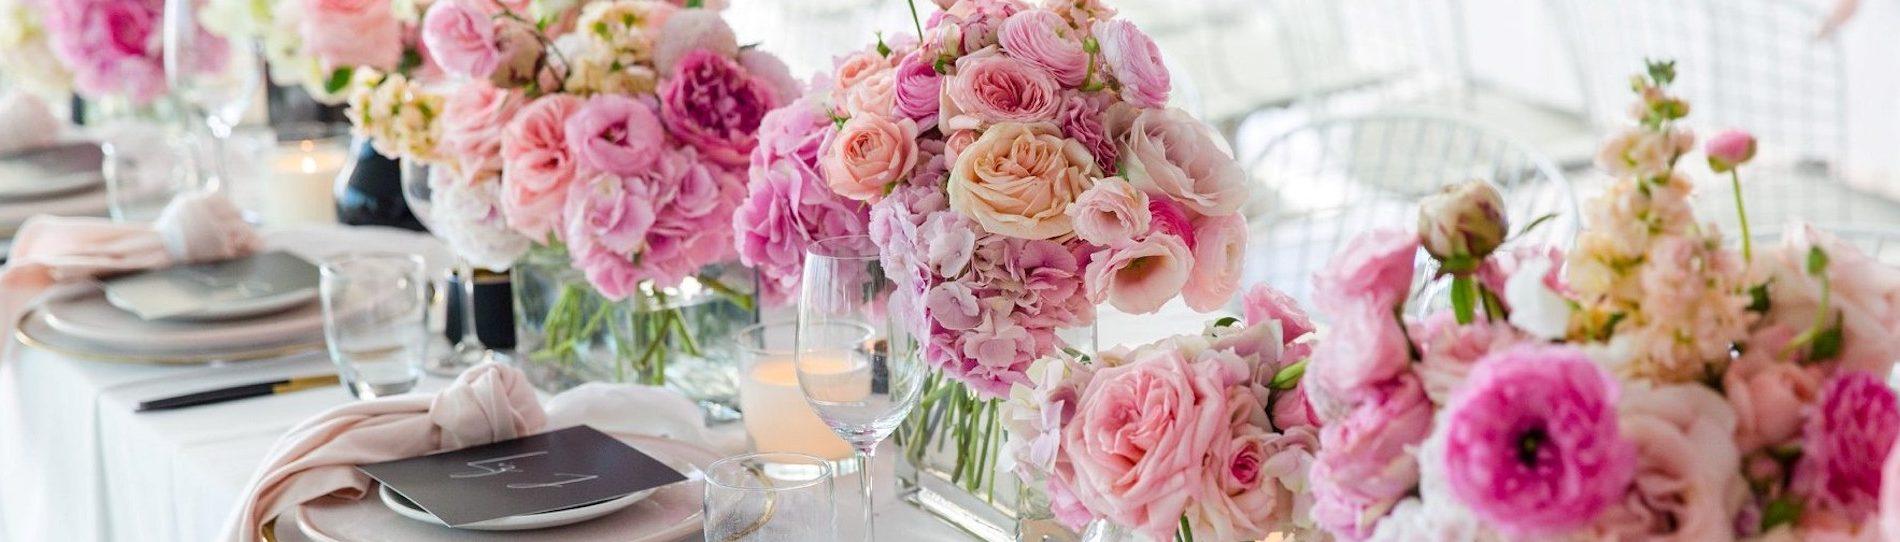 wedding planning companies brisbane